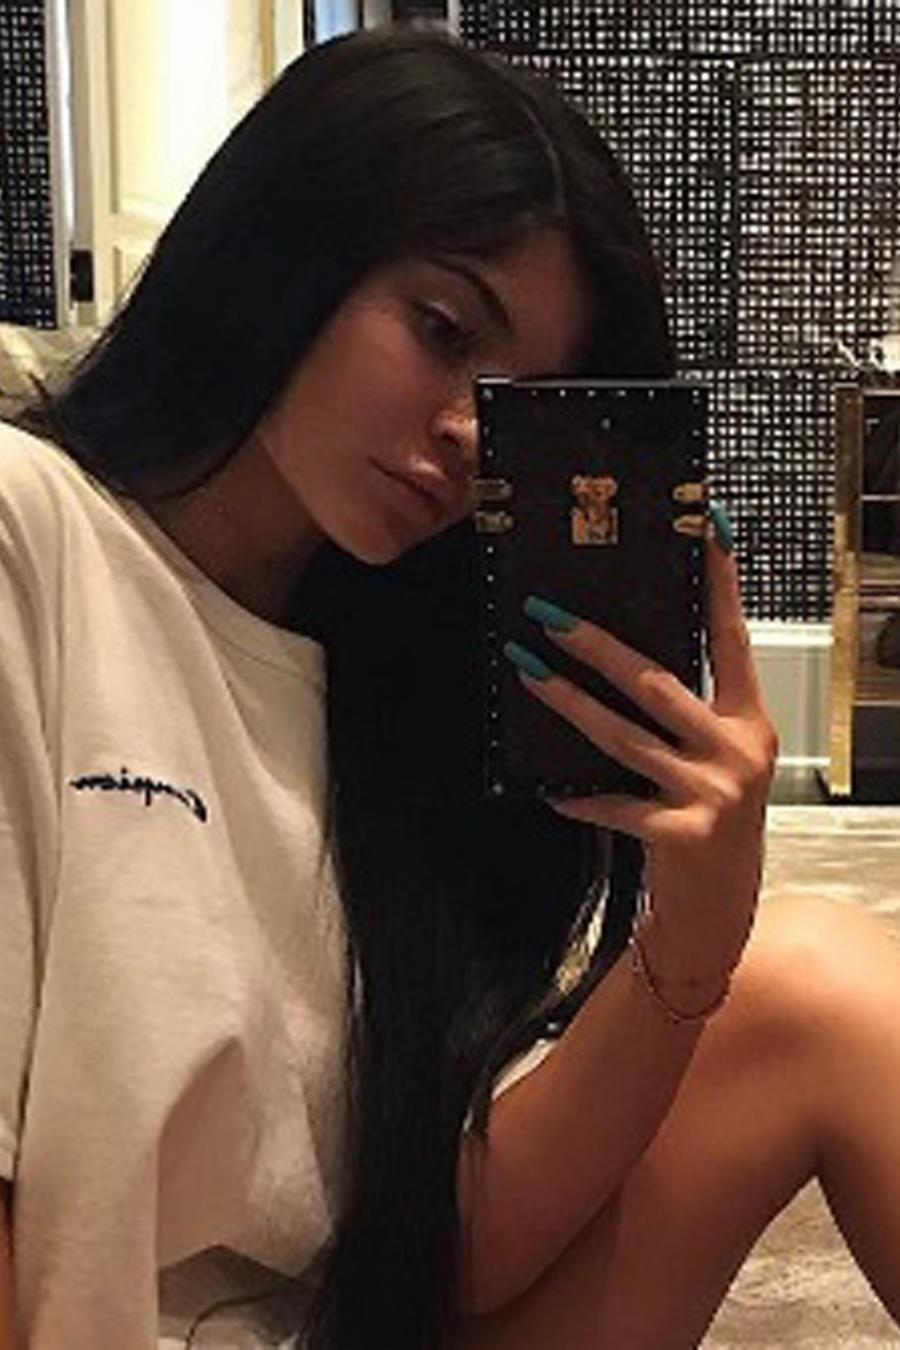 Kylie Jenner con botas y camiseta larga